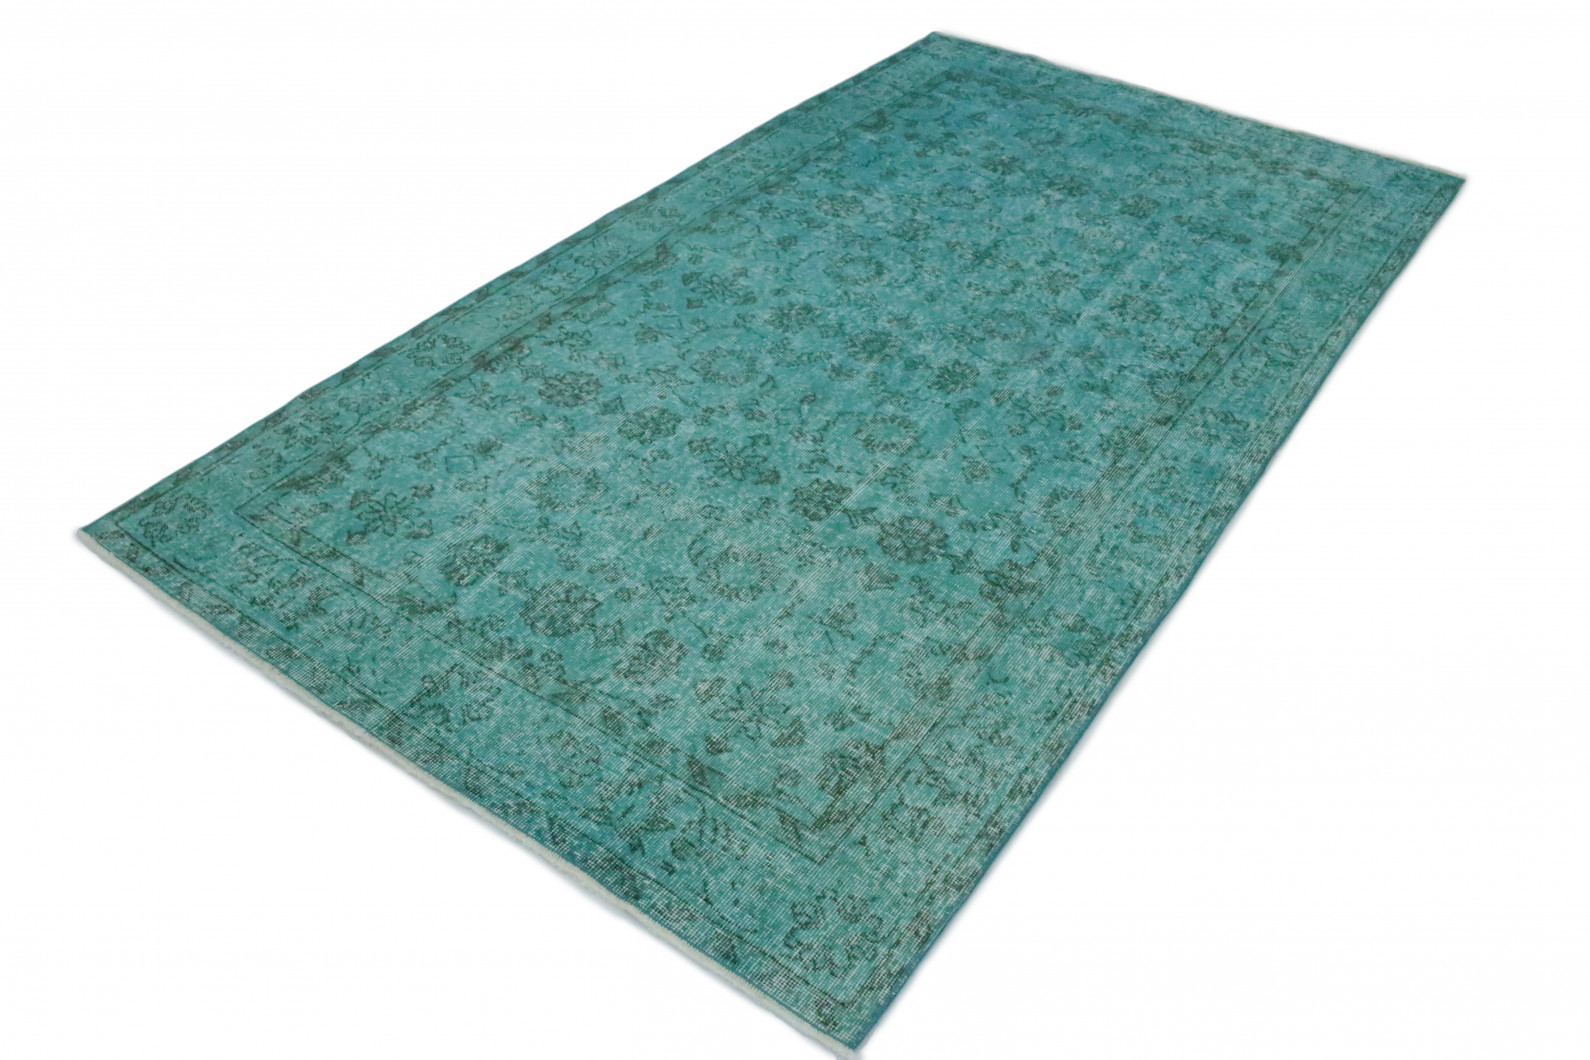 vintage teppich t rkis in 250x140 1011 1335 bei kaufen. Black Bedroom Furniture Sets. Home Design Ideas